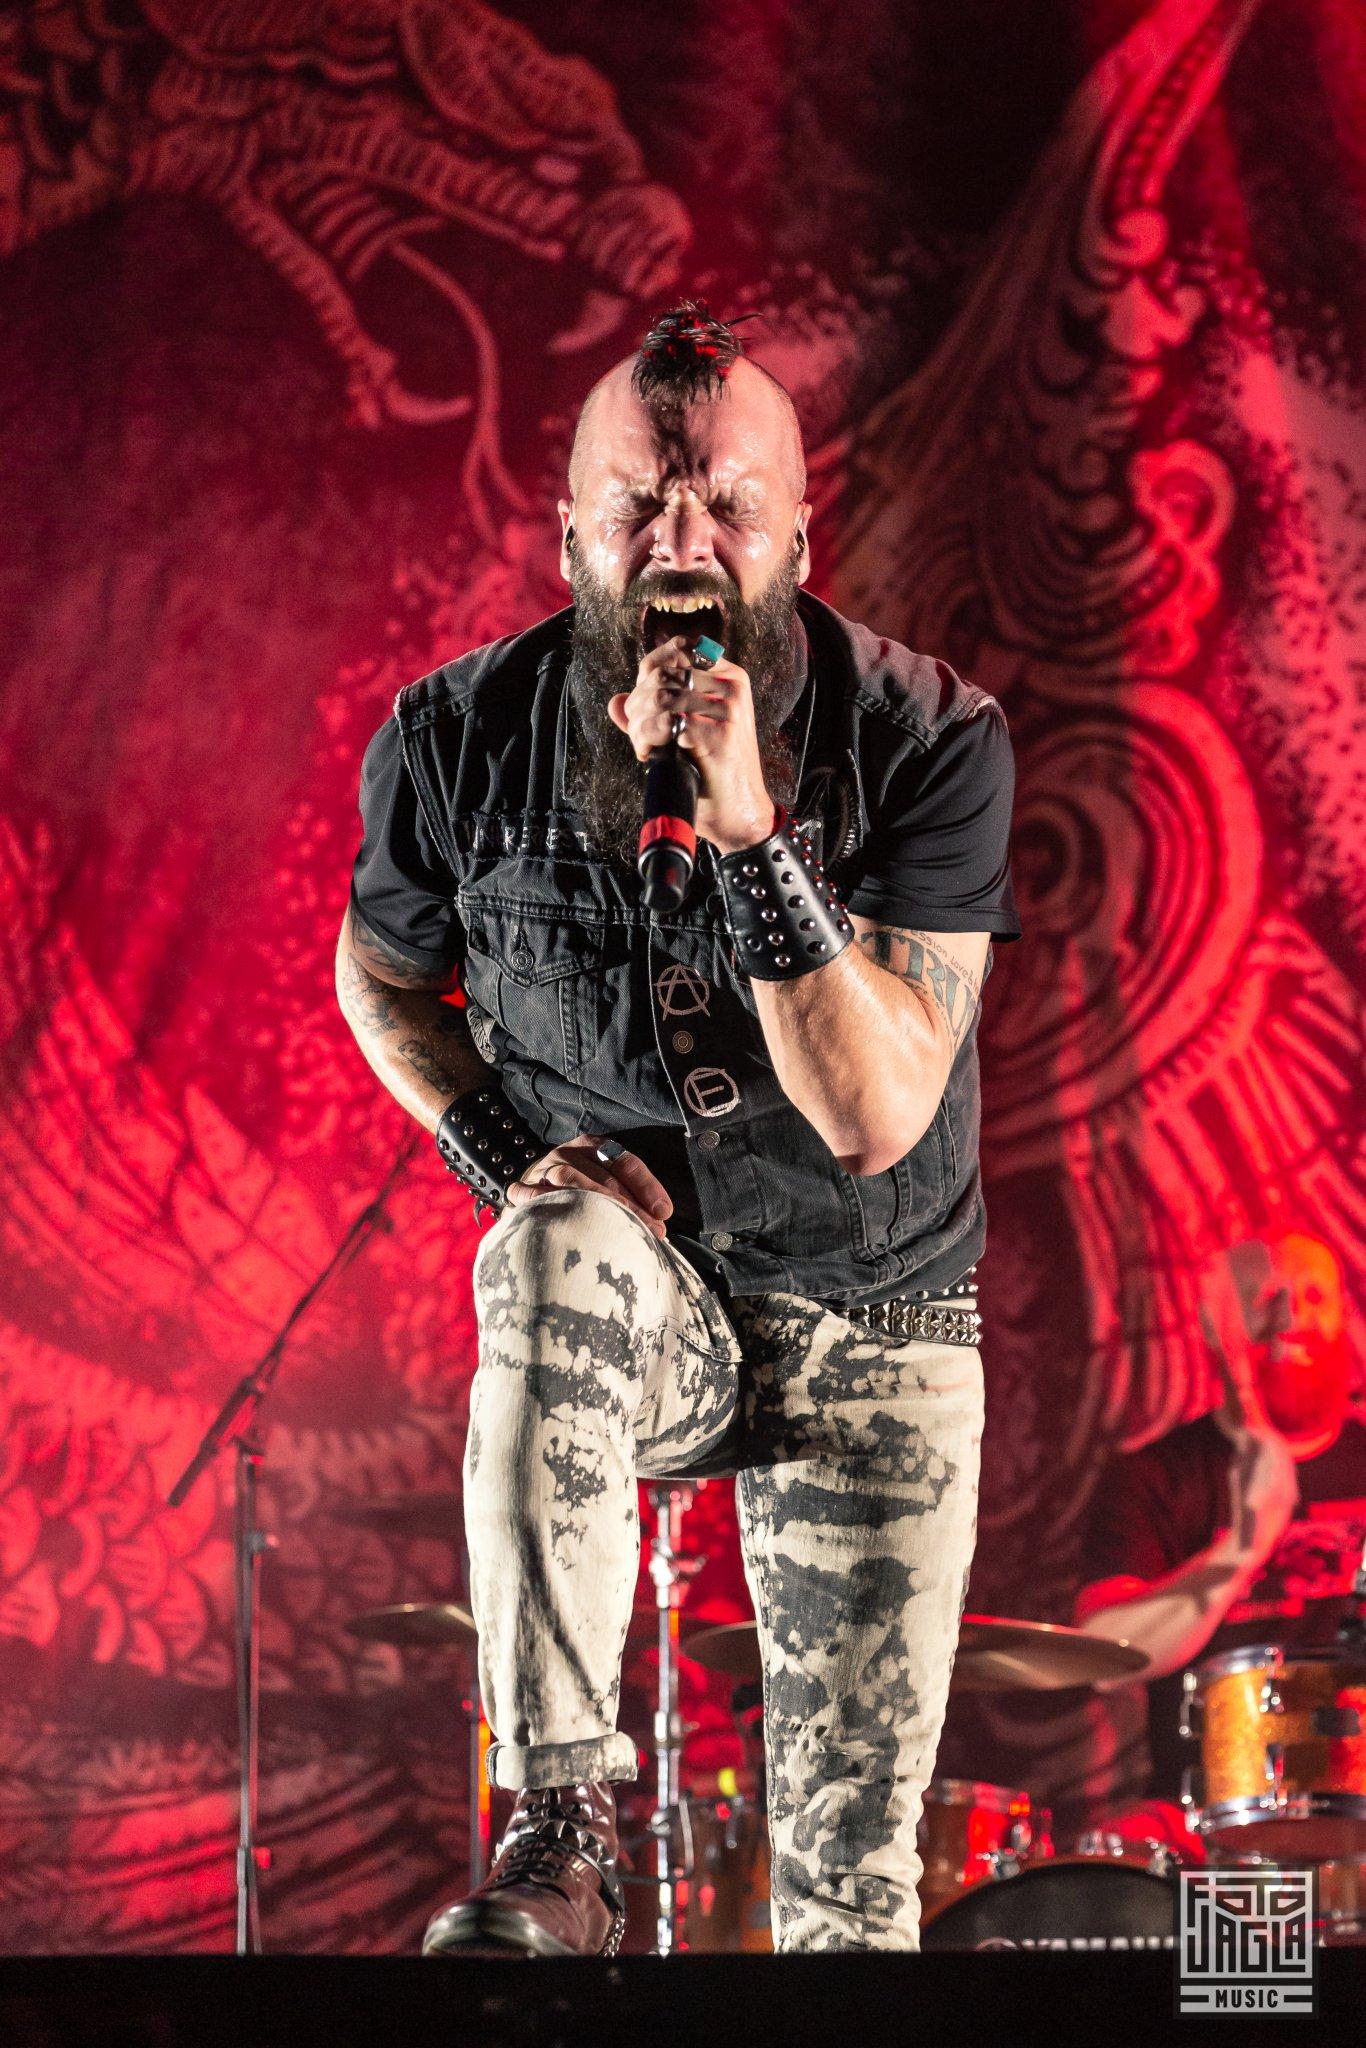 Killswitch Engage als Support-Act auf der Parkway Drive Reverence Tour 2019 in Köln (Palladium)